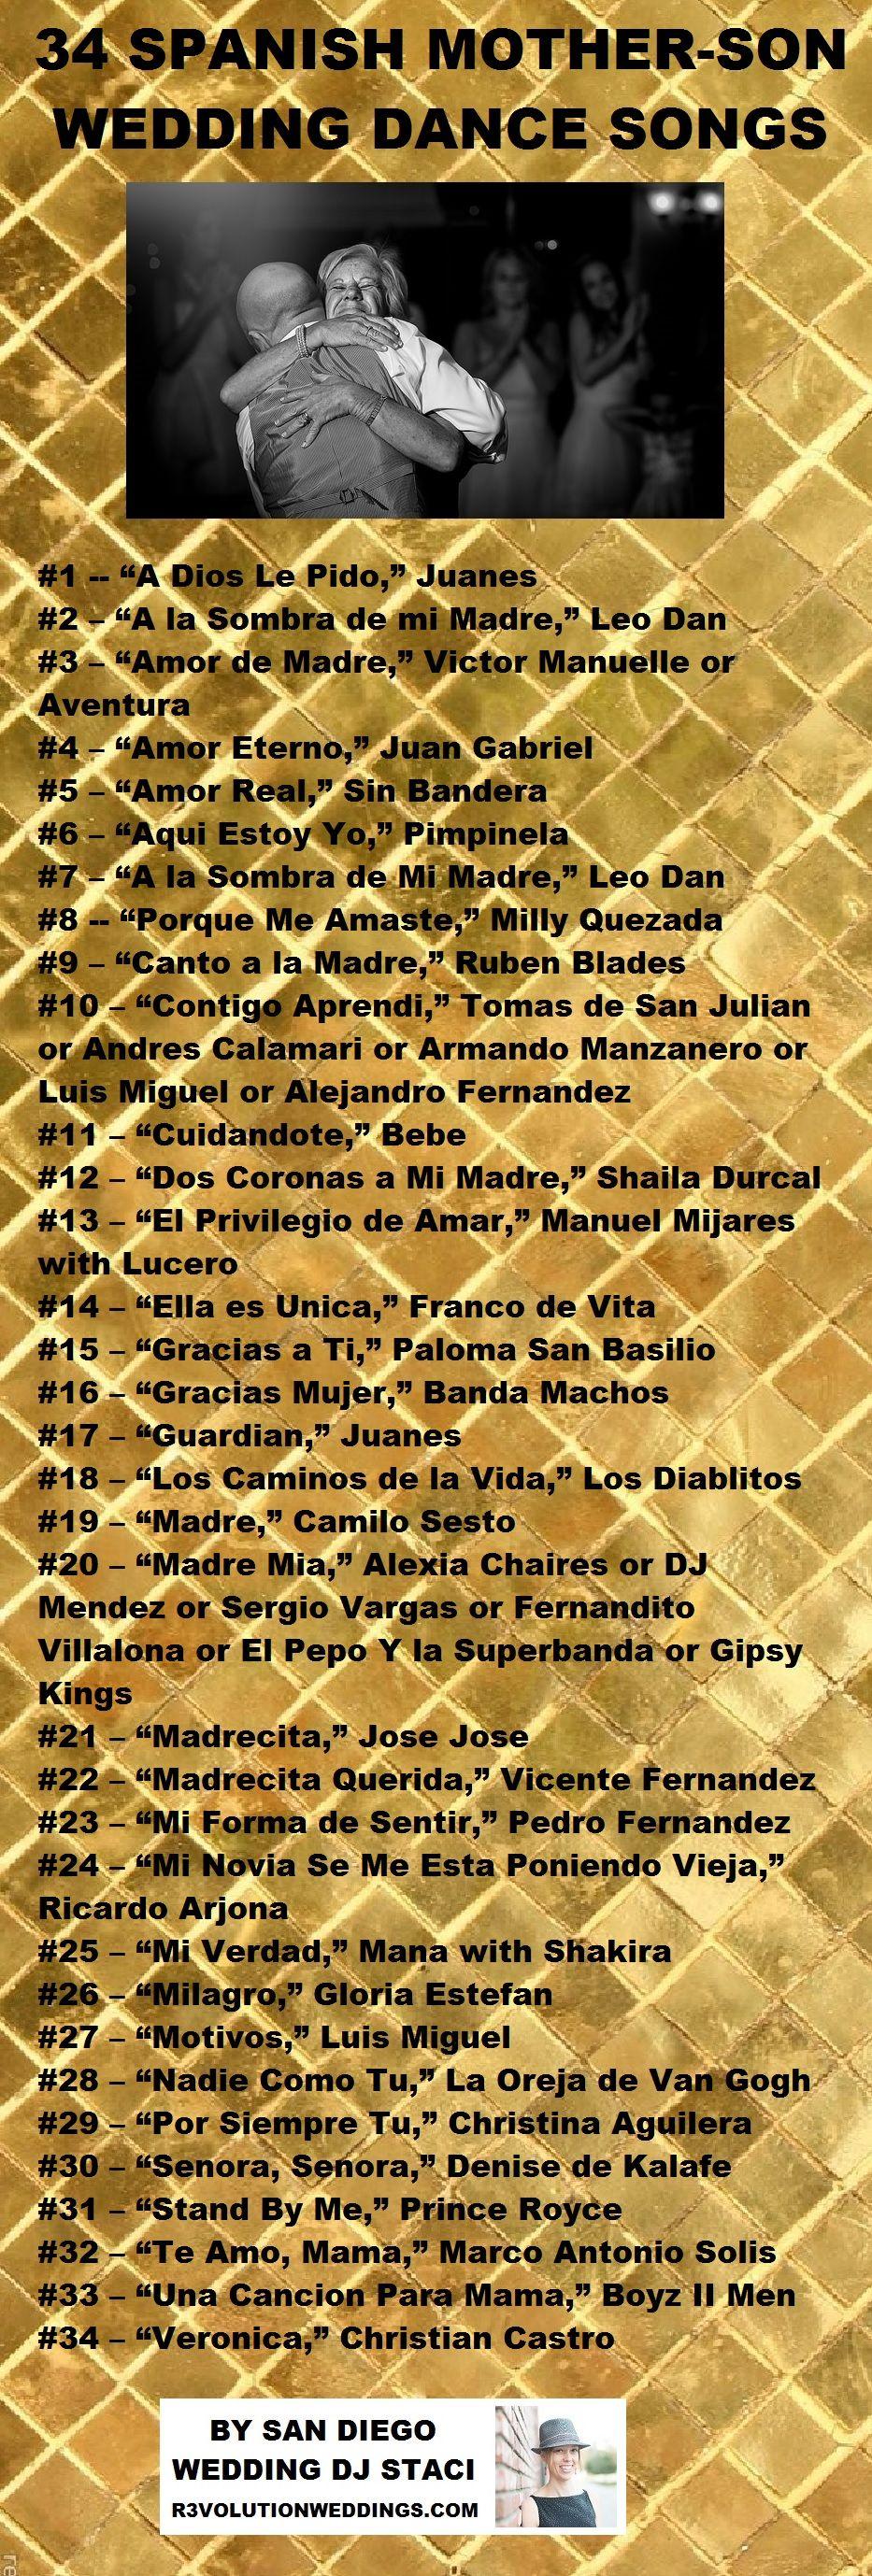 34 Spanish Mother Son Dance Songs for Your Wedding   Revolution ...